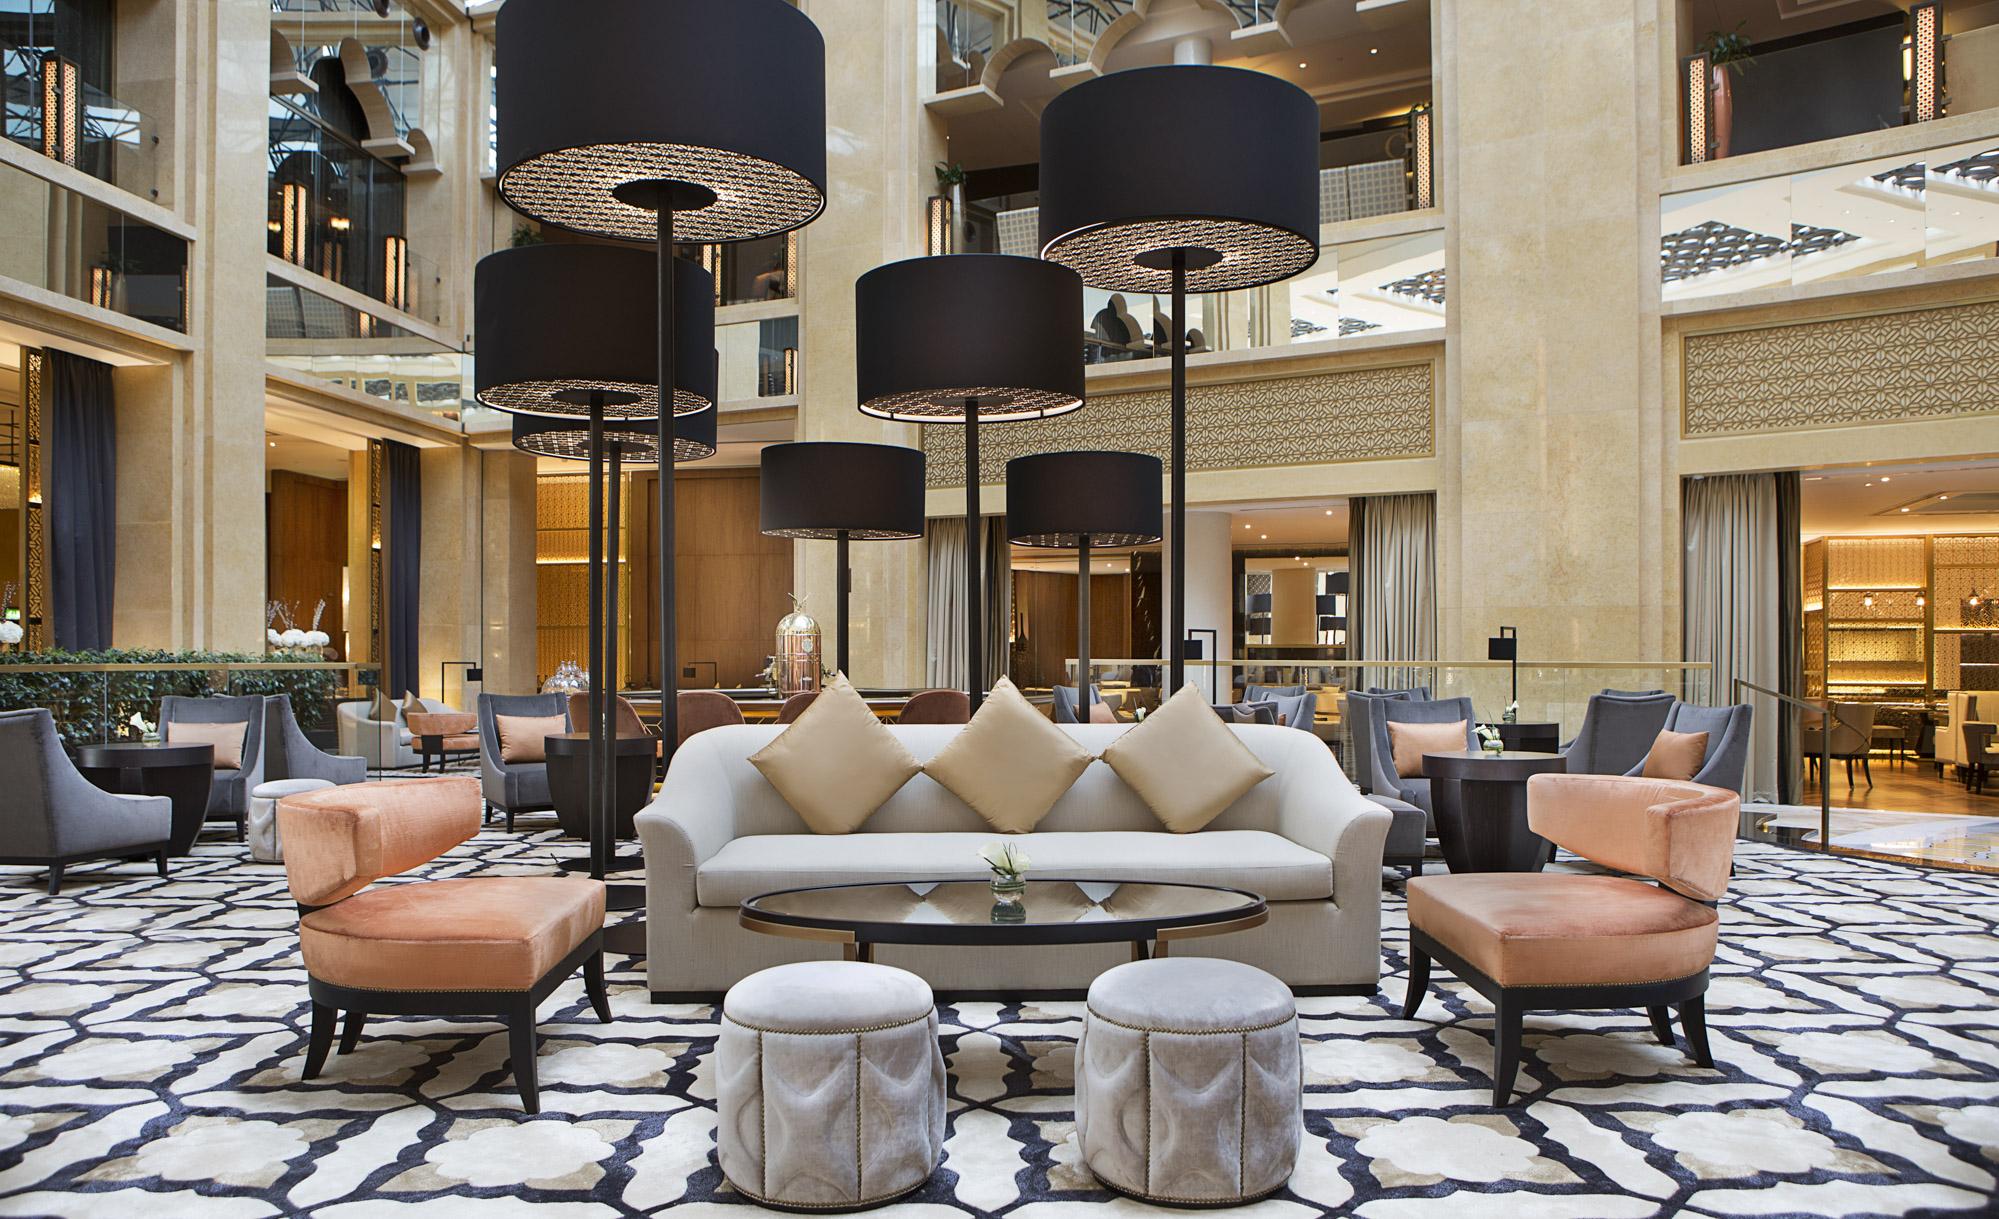 Best Hotels in Dubai Archives - Dubai Chronicle